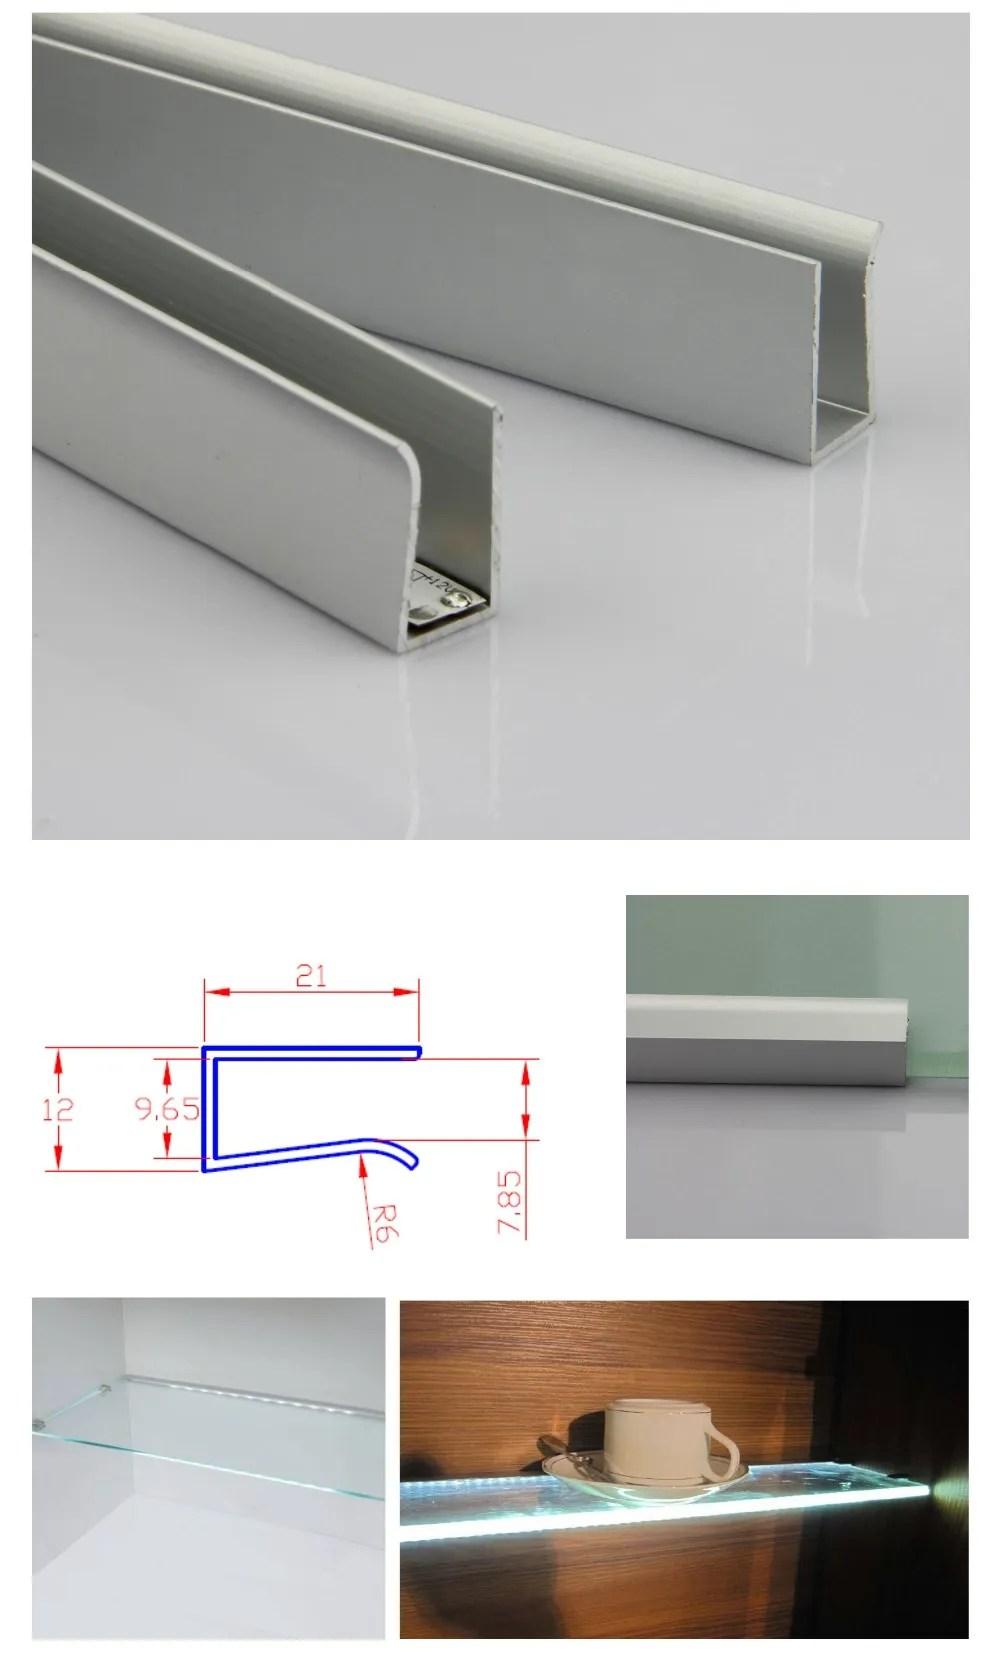 lighting profile led aluminum profile for 8mm glass edge buy led aluminum profile lighting profile led aluminum profile for 8mm glass edge lighting